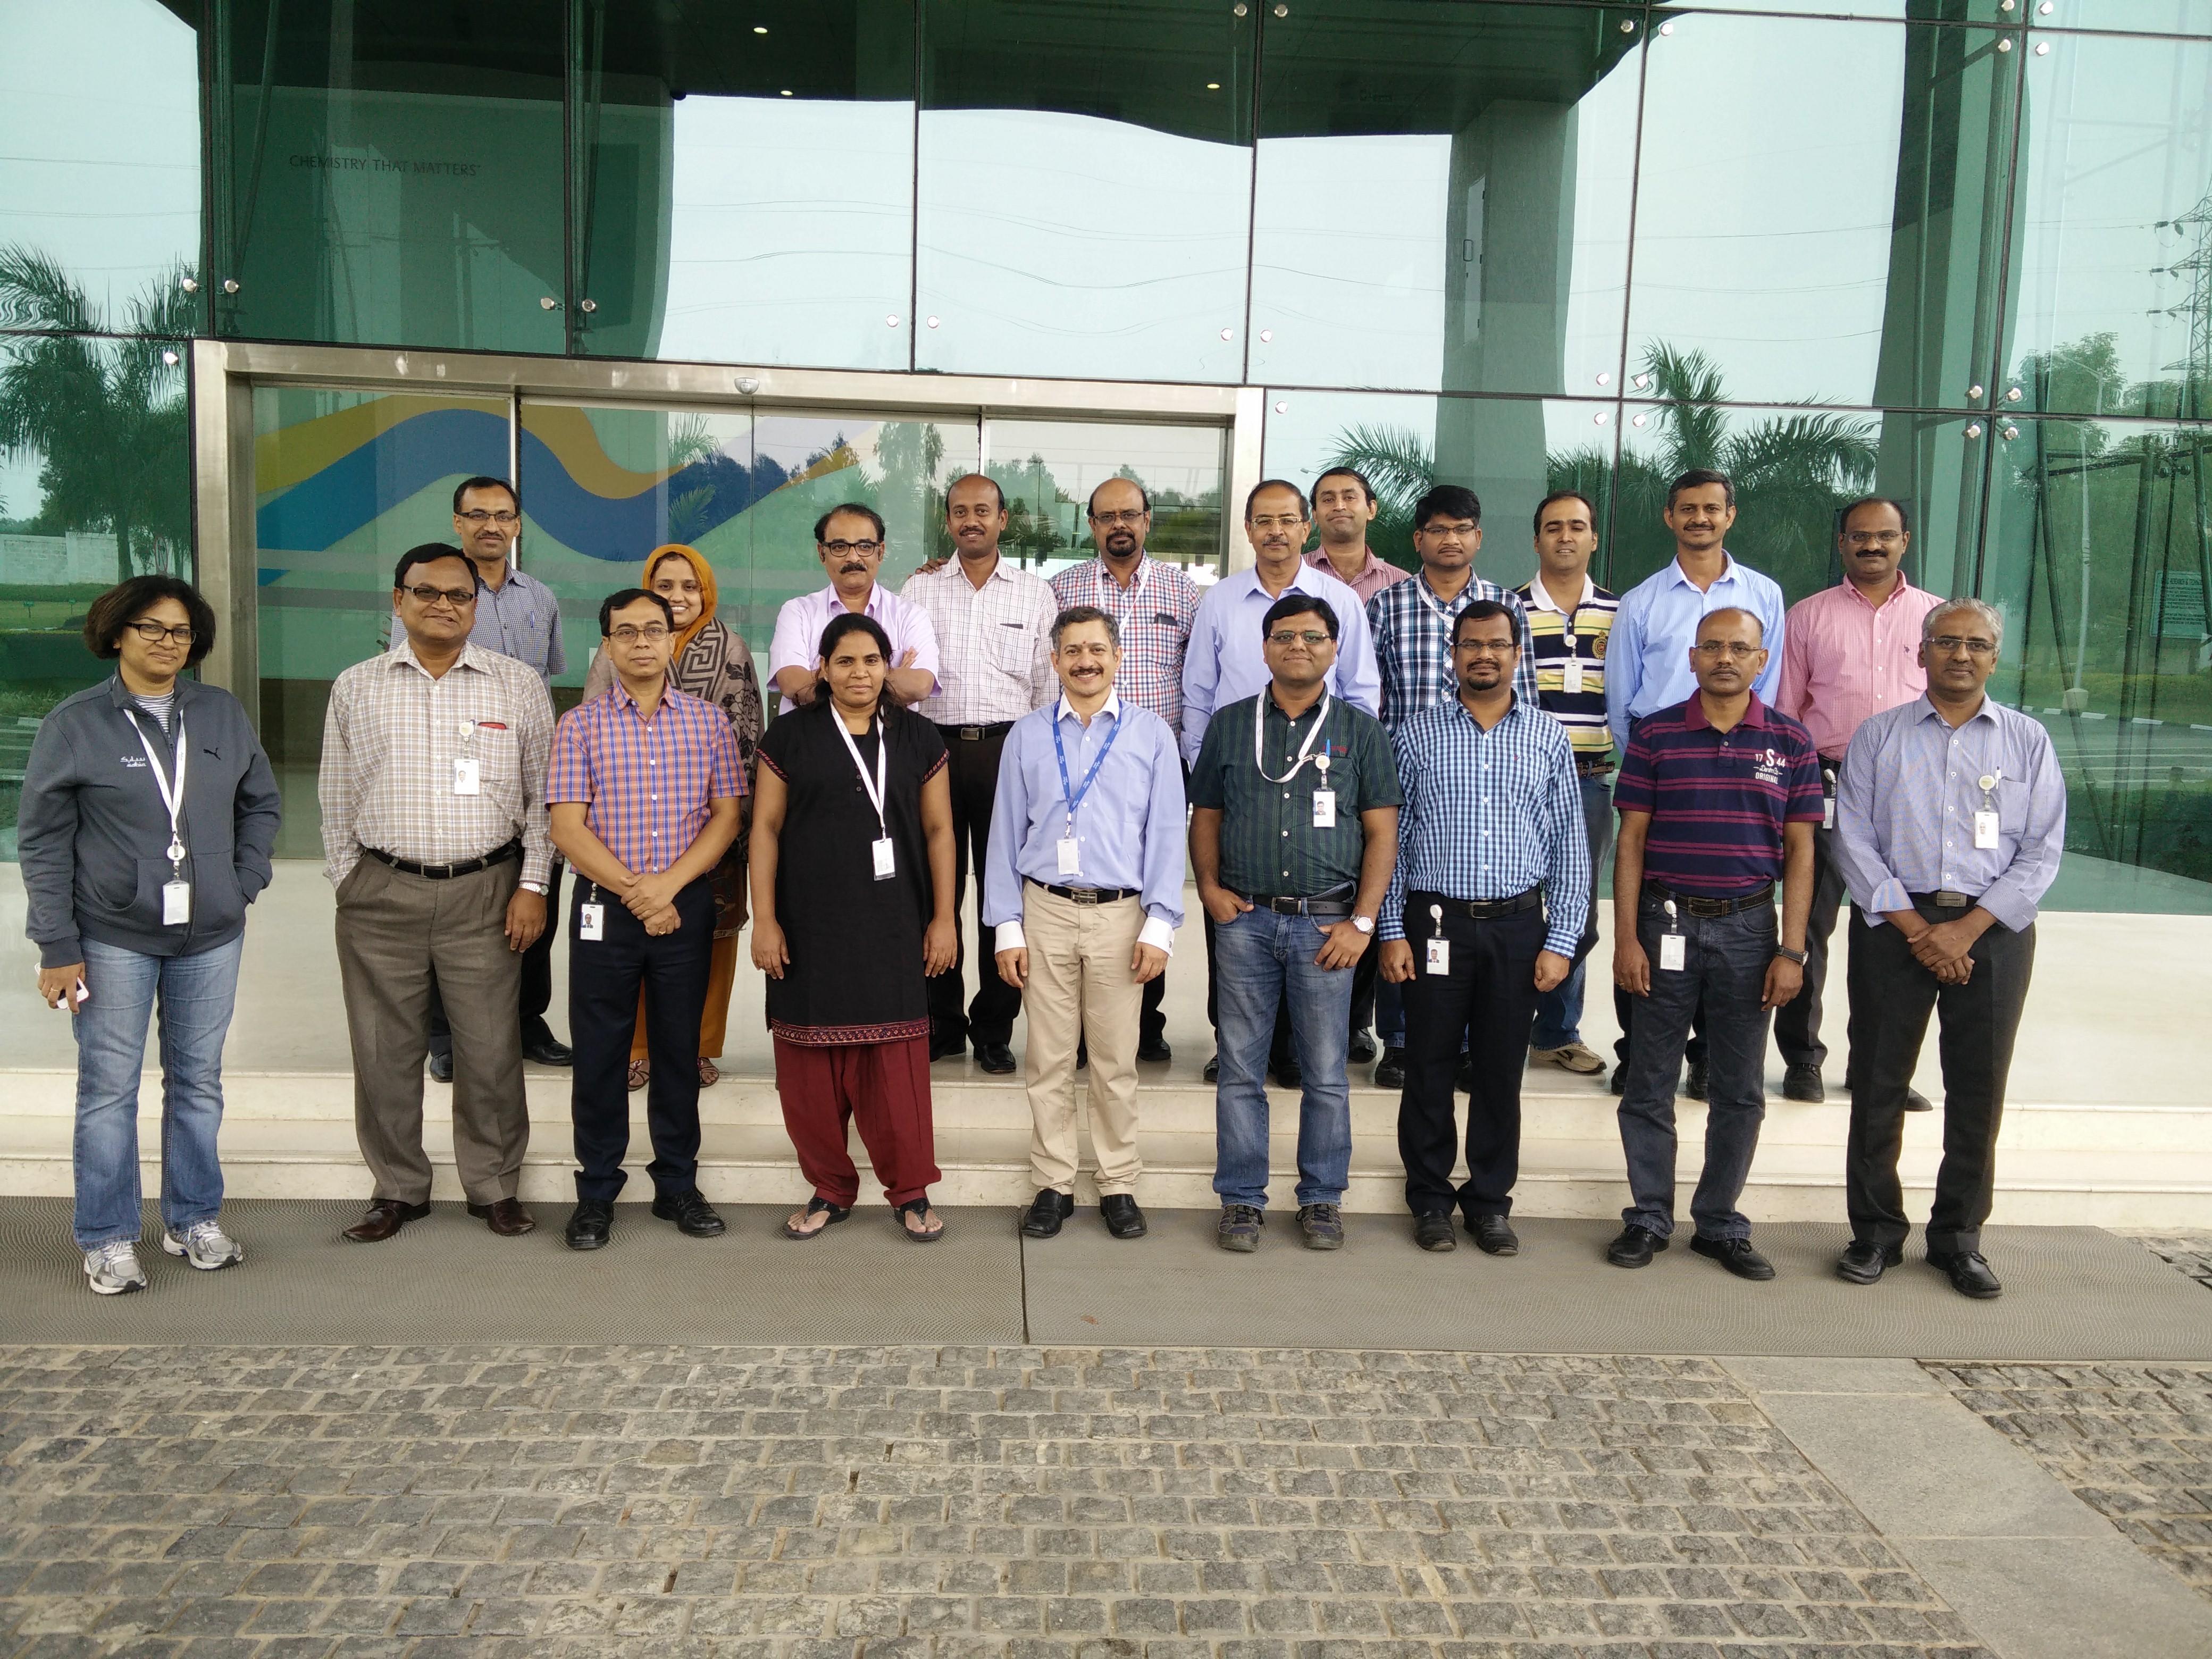 TRIZ level 1 workshop with 6 chief scientists